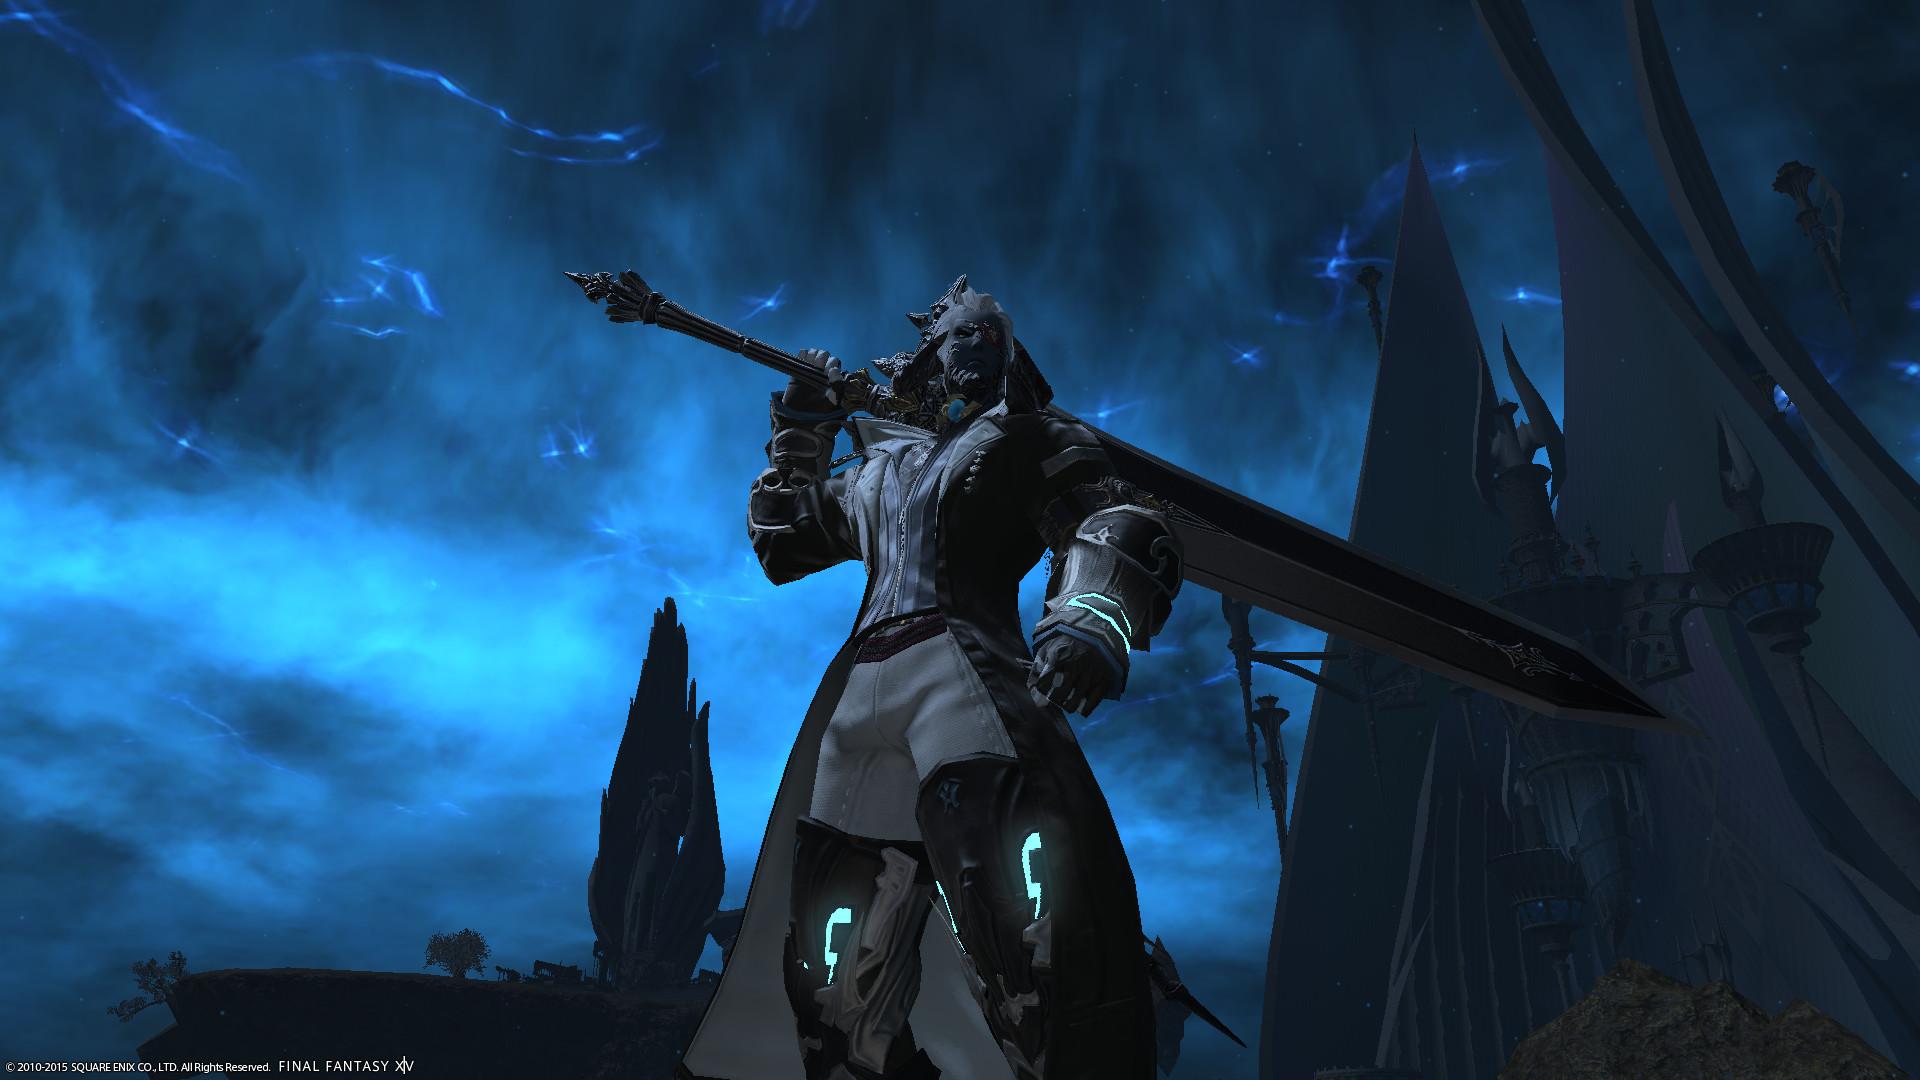 Doomtrain Suplex the Magitek Dark Knight